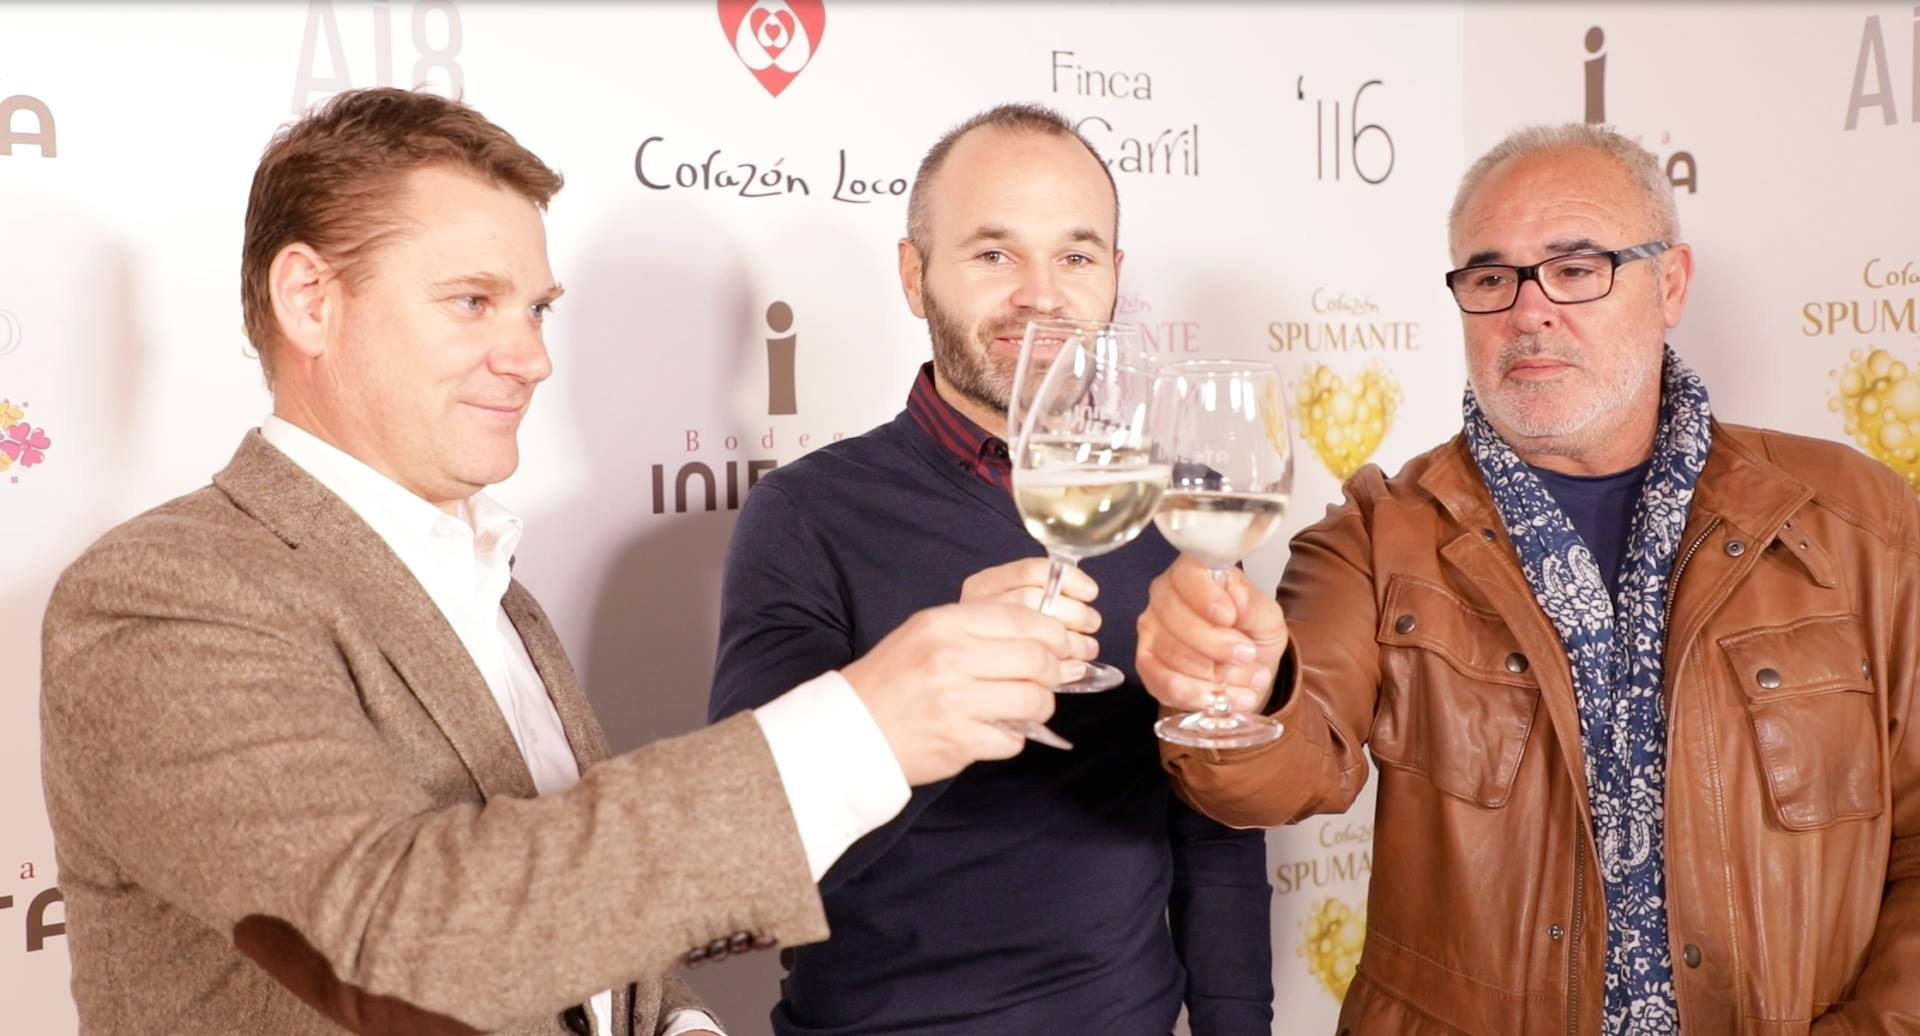 Andres Iniesta Brand Endorsements Brand Ambassador Sponsorship Partners Advertising TVC Spain BarcelonaBodega Iniesta